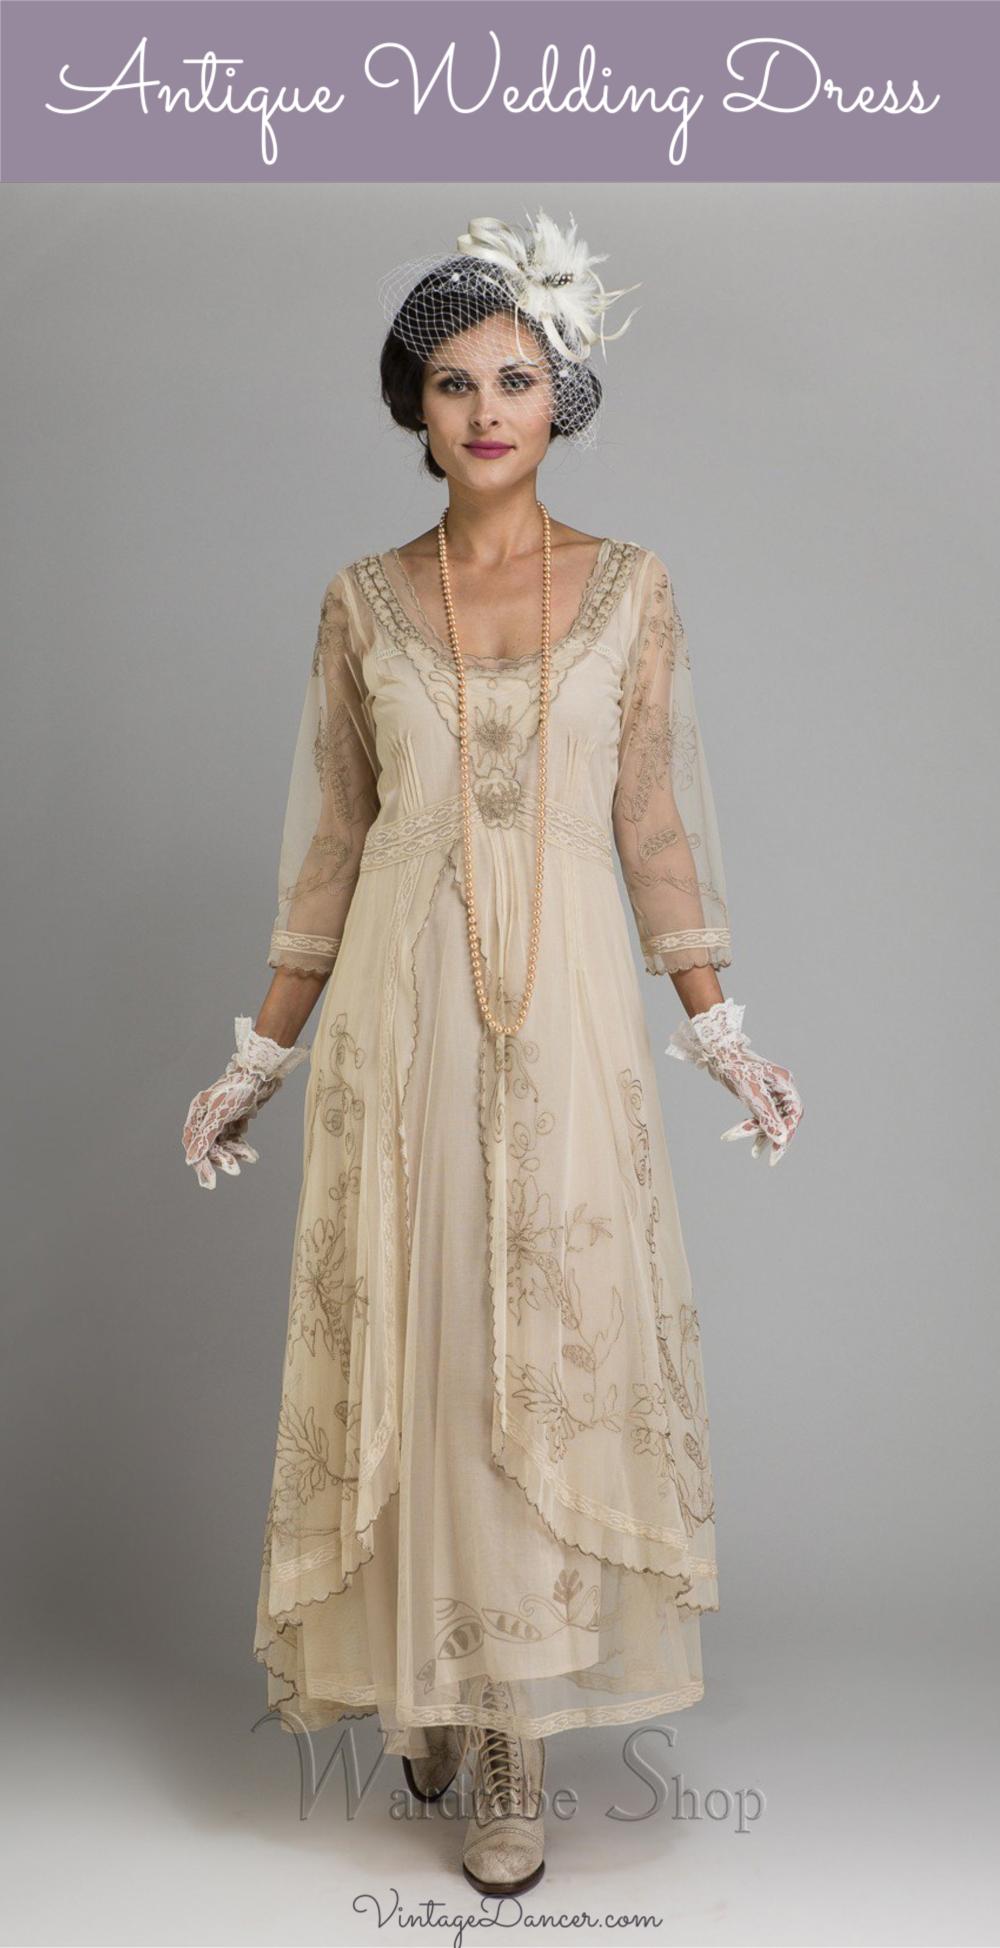 Pin on Wedding Vintage Dresses